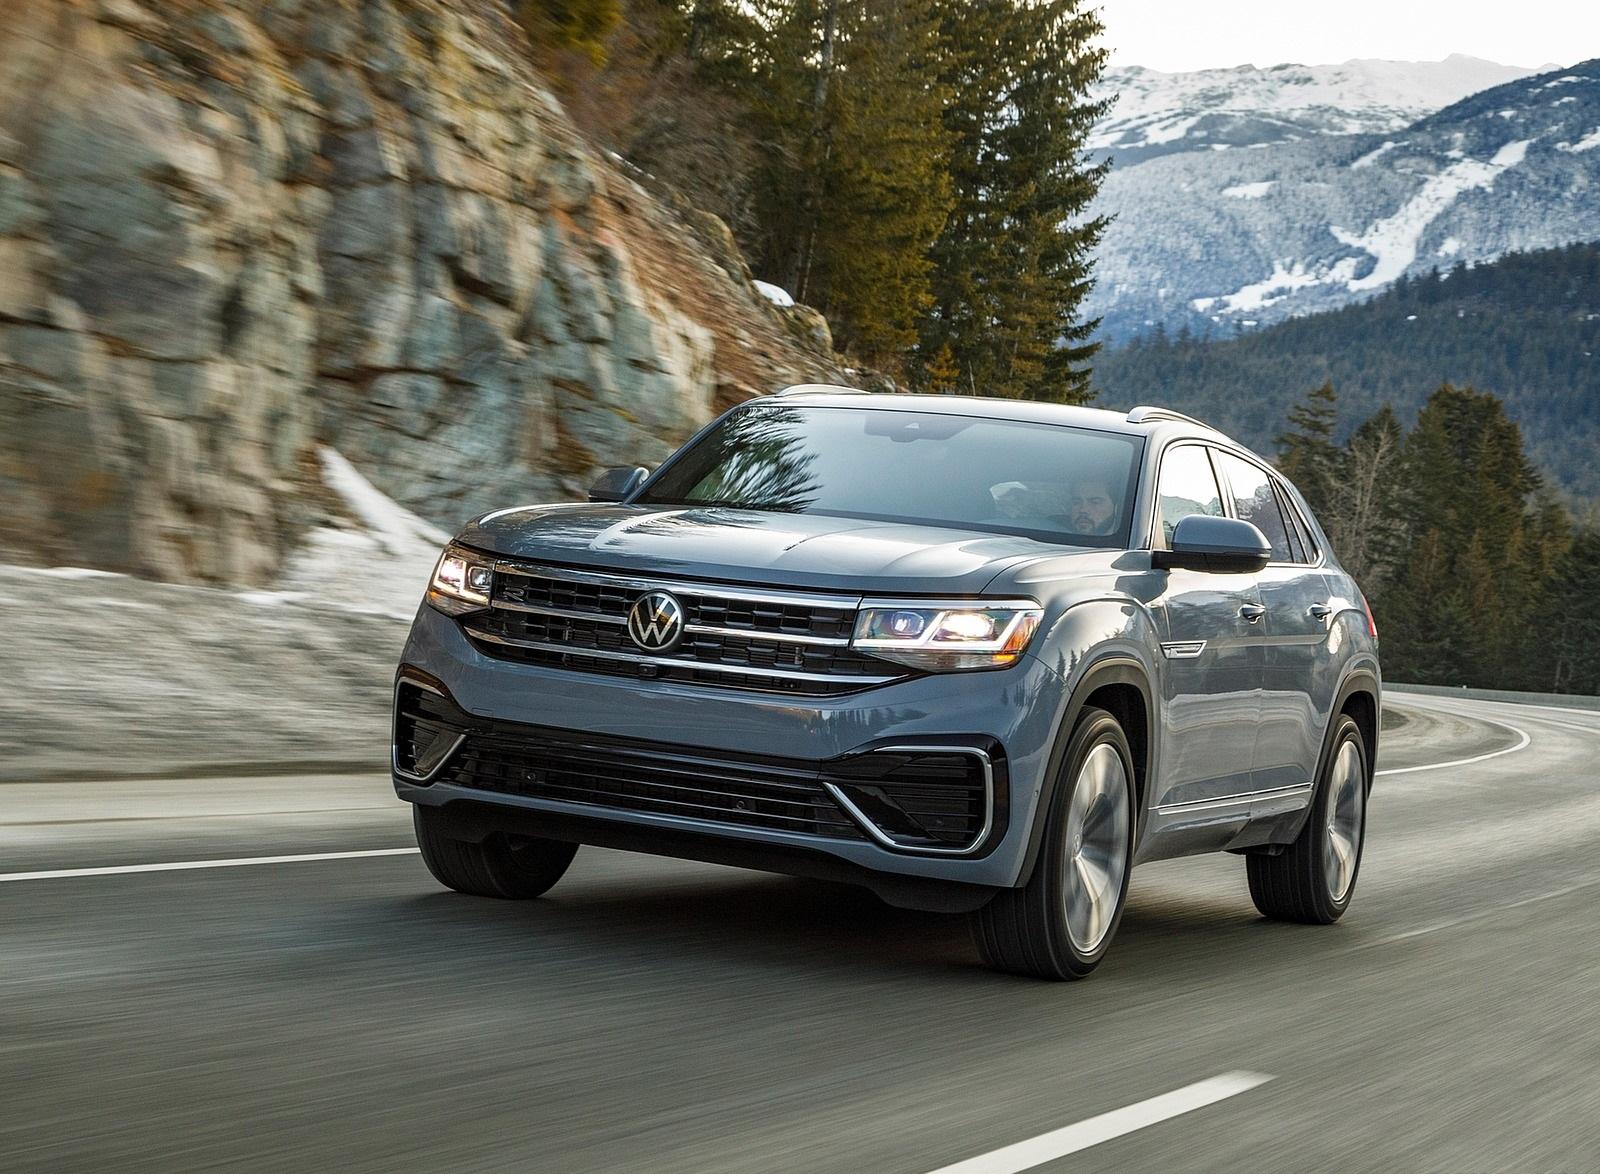 2020 Volkswagen Atlas Cross Sport SEL Premium R Line (Color: Pure Gray) Front Three-Quarter Wallpapers (4)